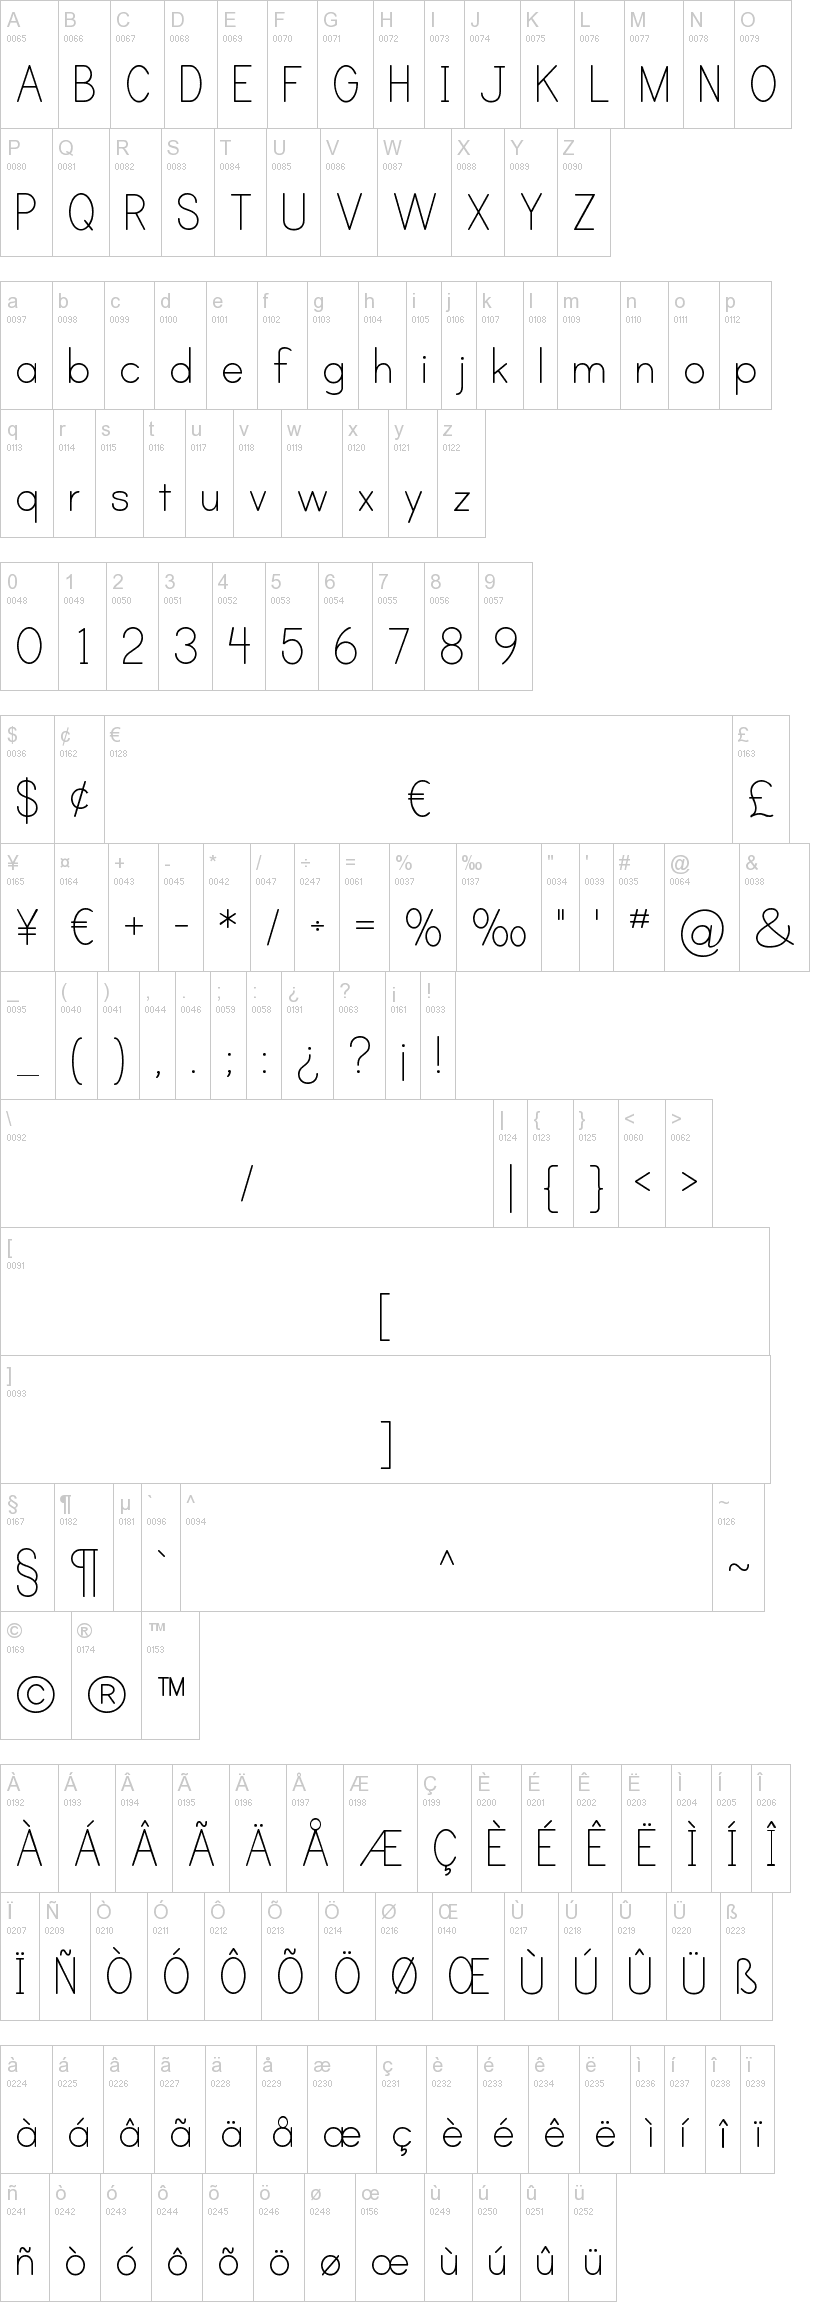 Print Clearly Font | Dafont | Font Sites | Print Fonts